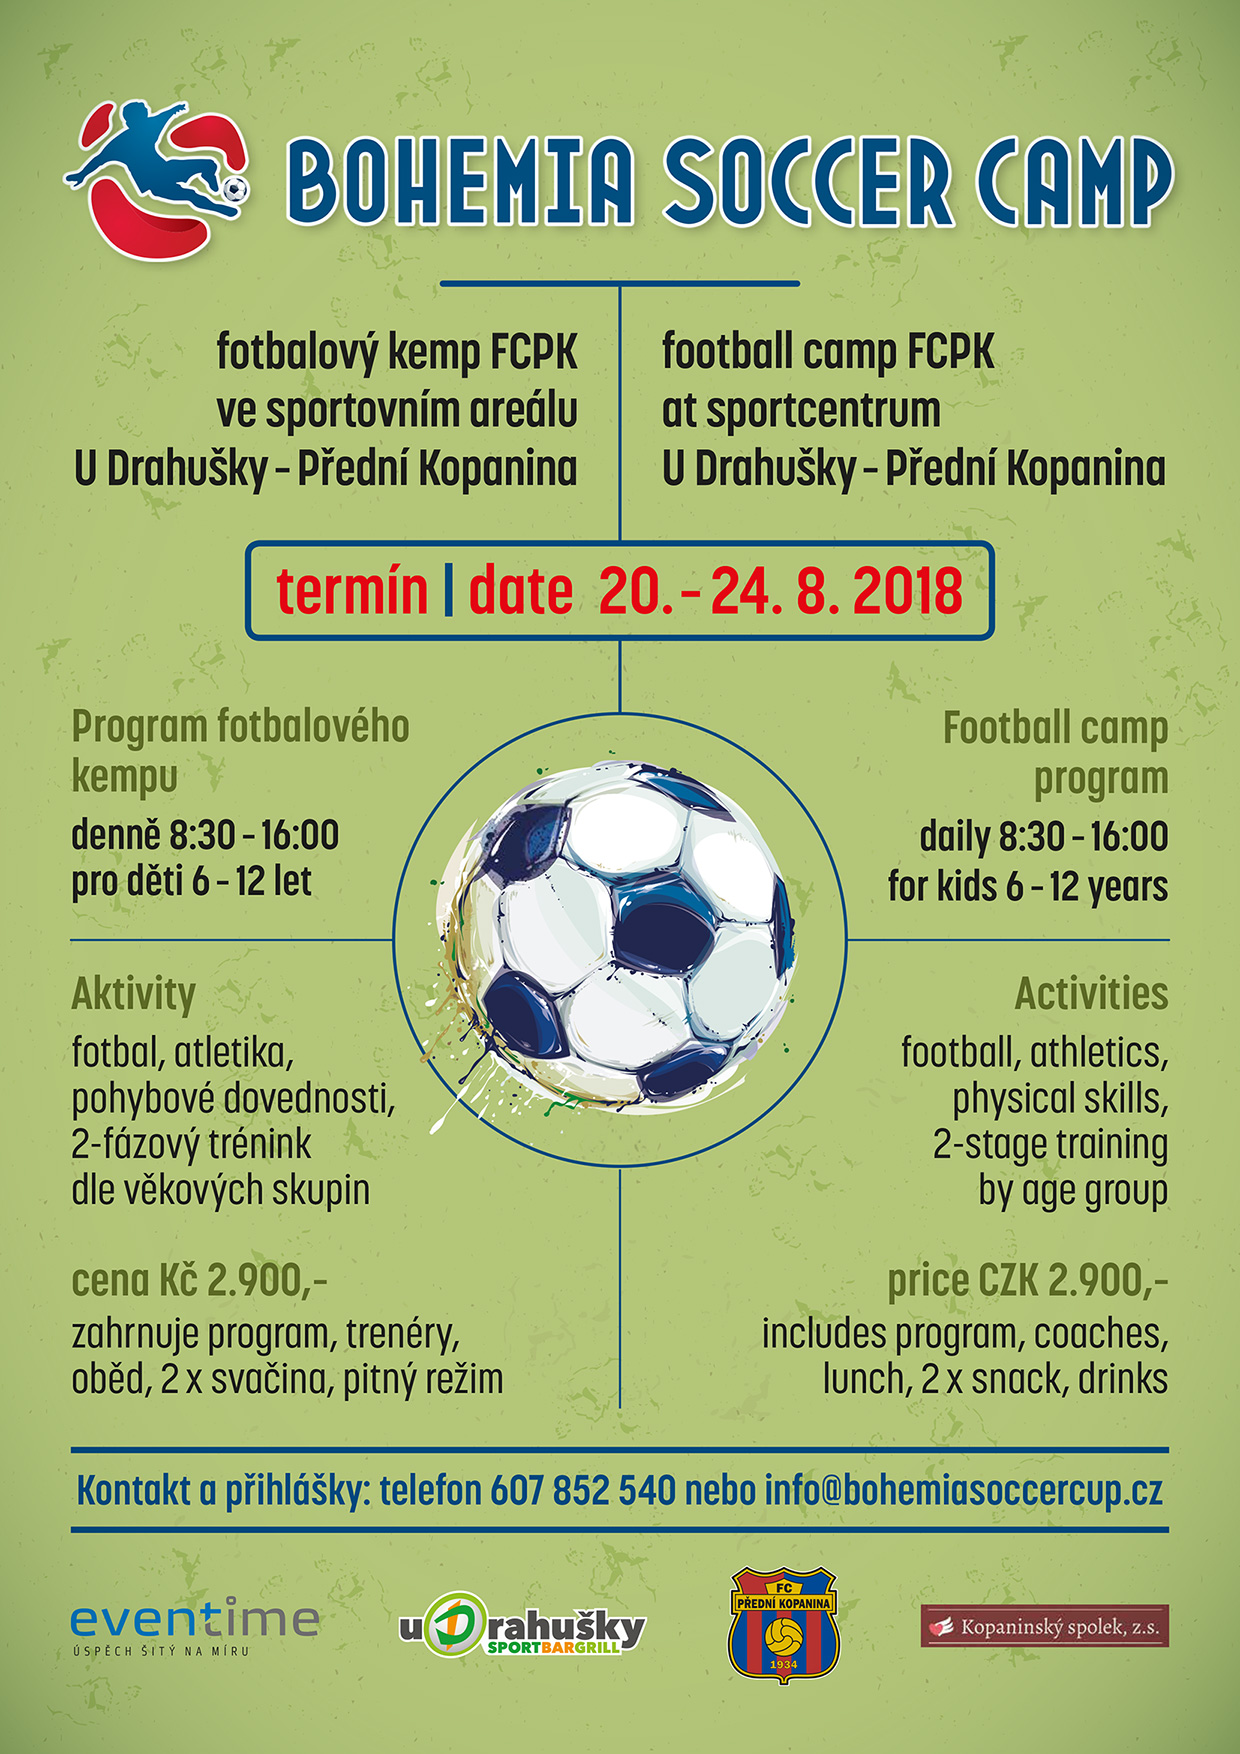 Bohemia Soccer Camp